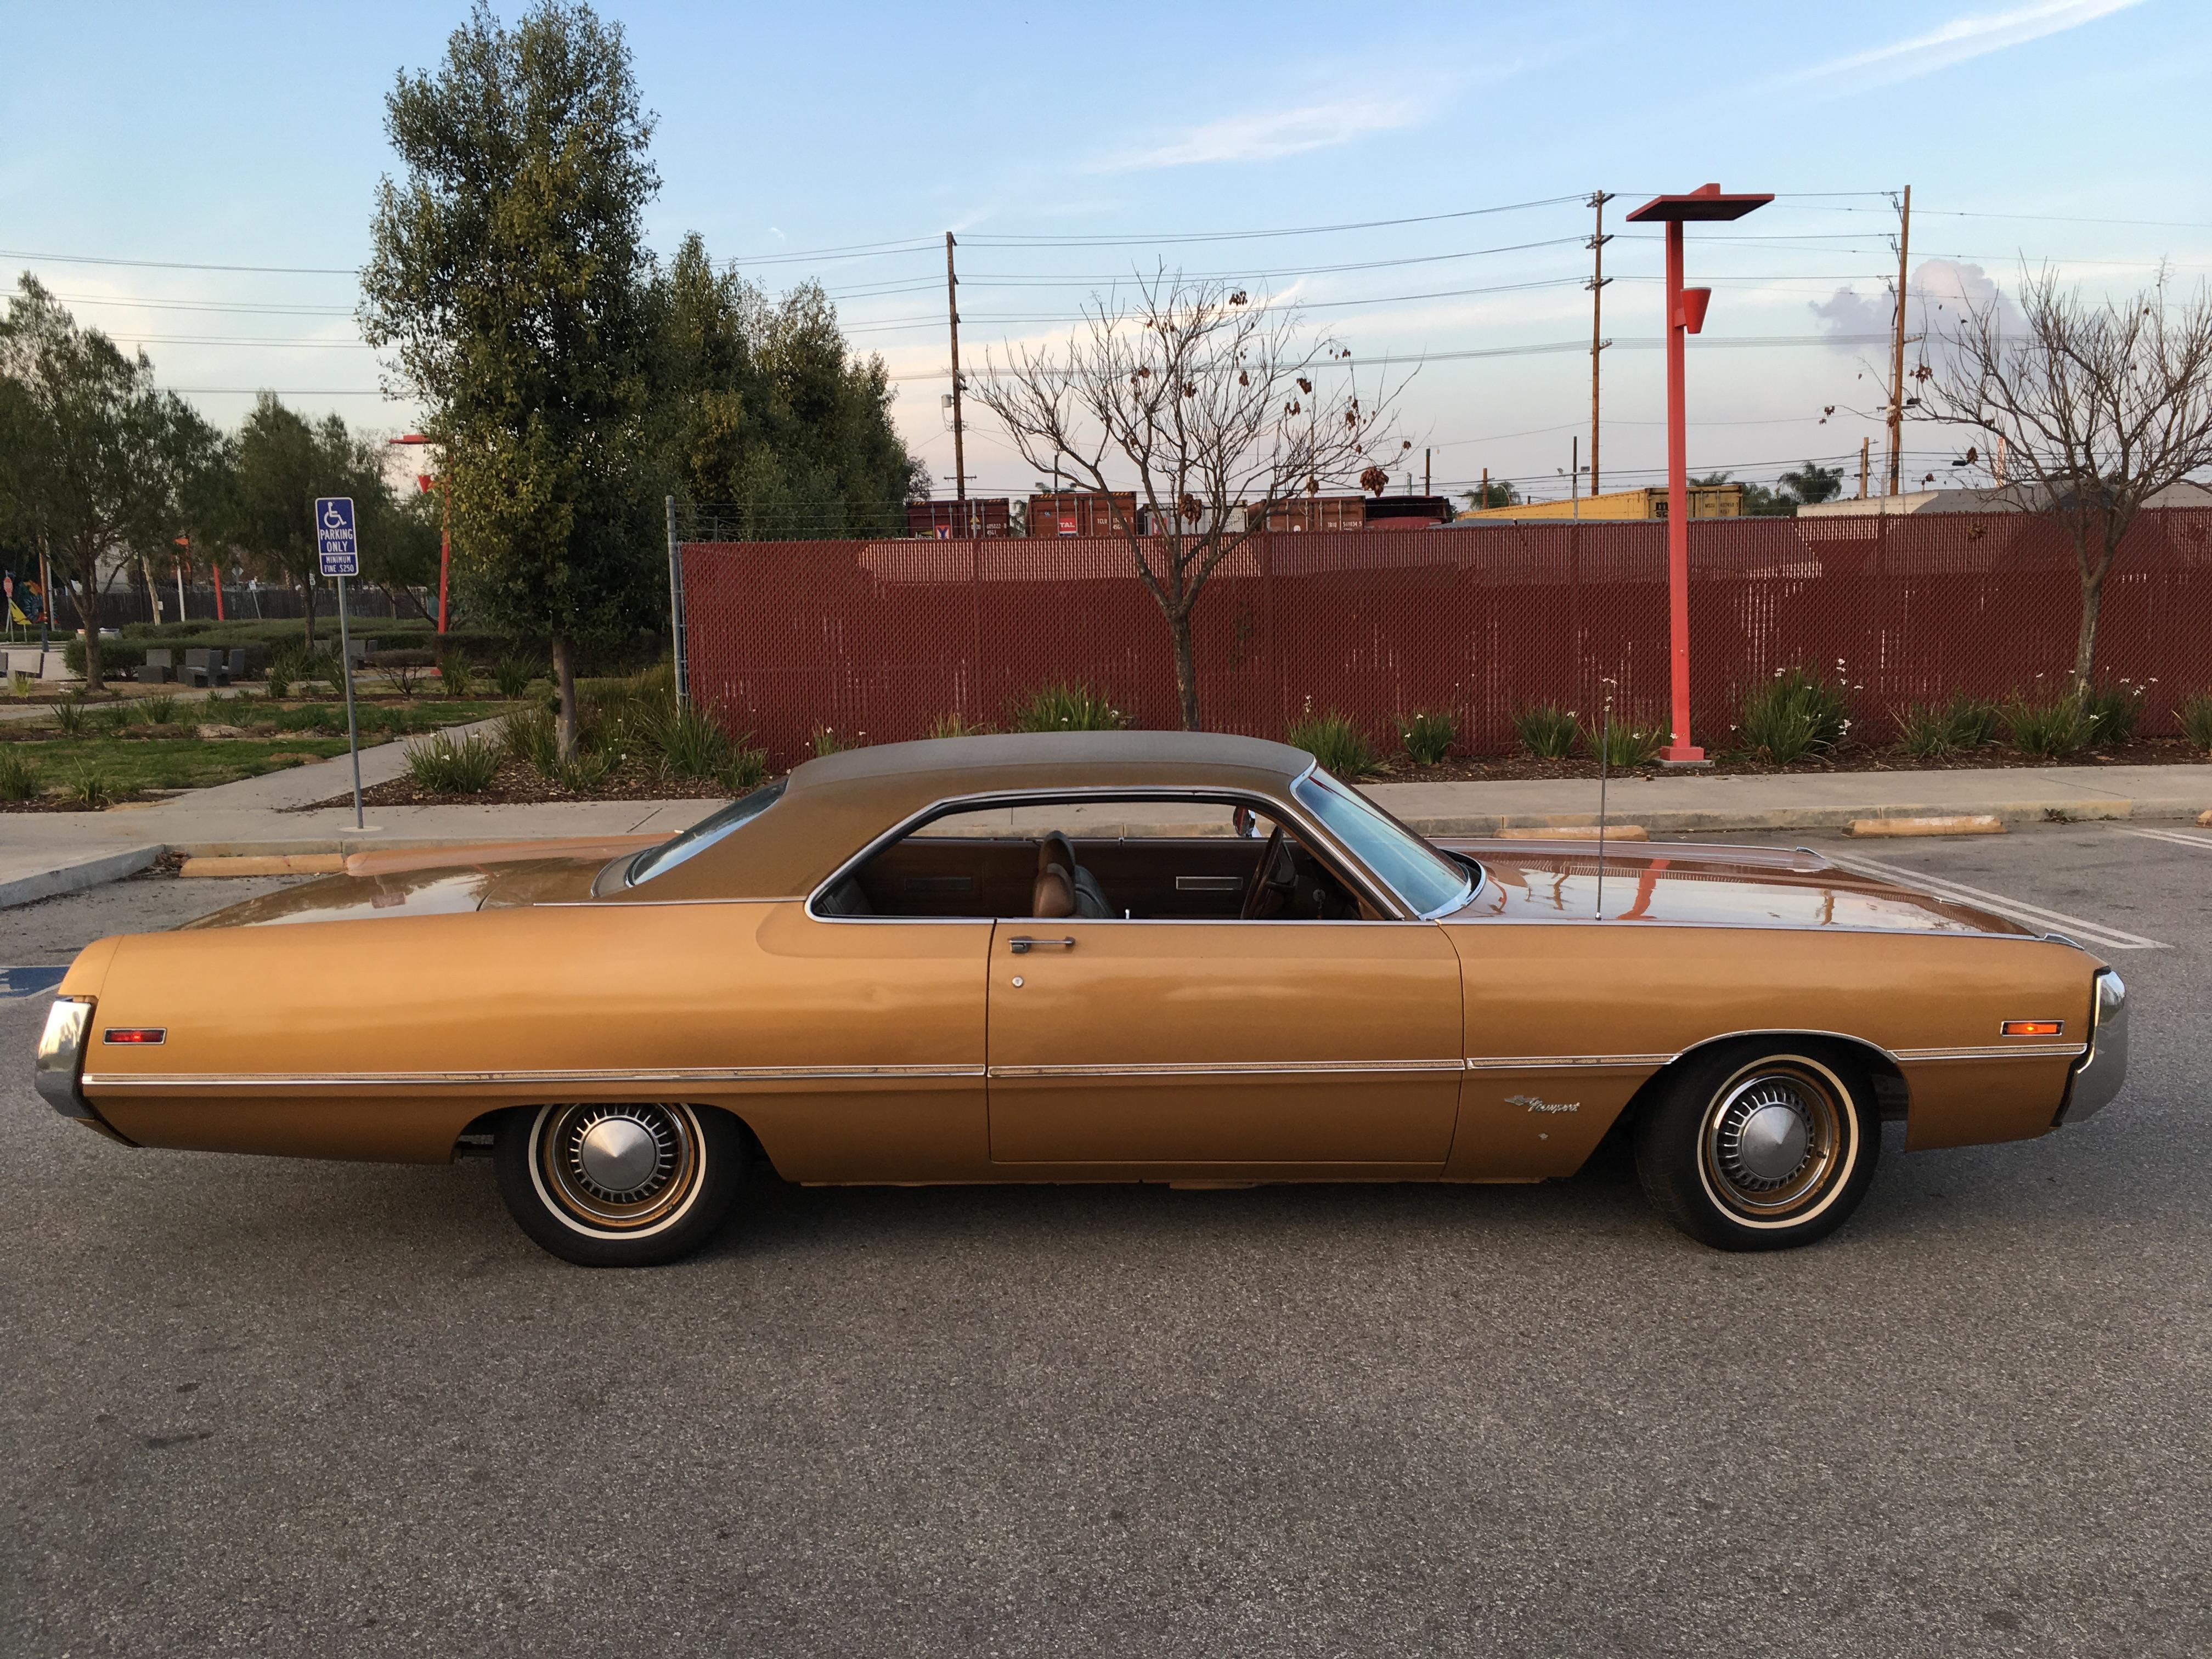 1970 Chrysler Newport - Cordoba Spring Special